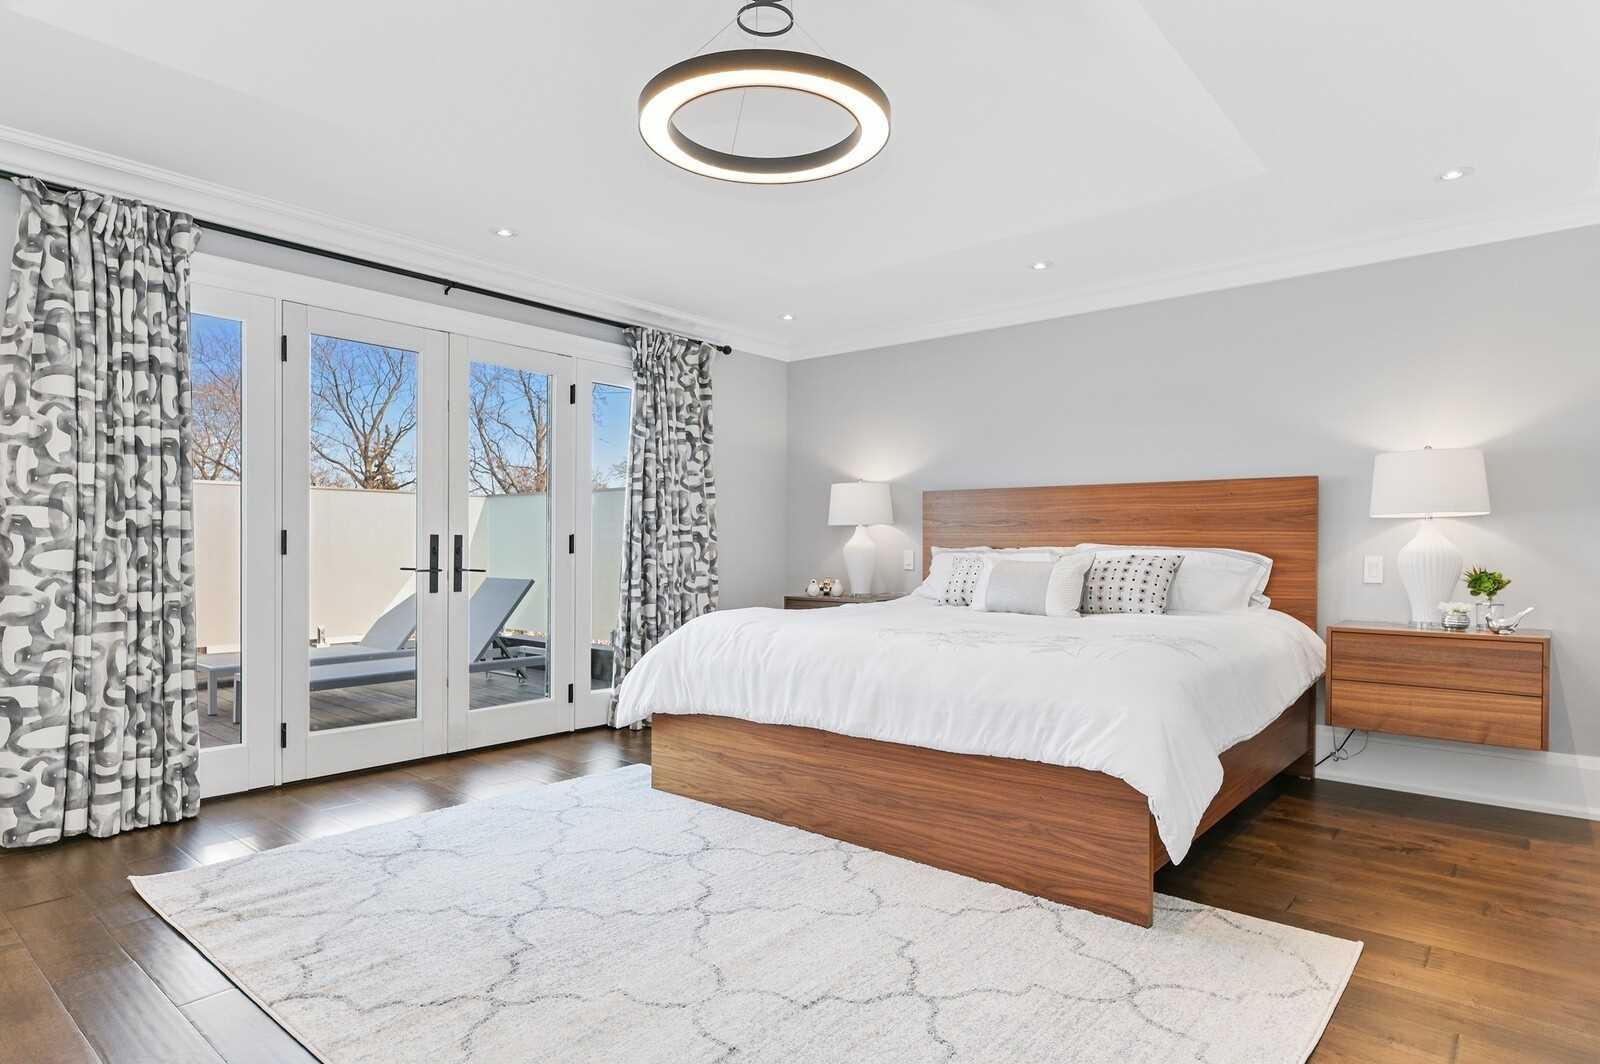 54 Lockheed Blvd, Toronto, Ontario M9P2J1, 4 Bedrooms Bedrooms, 13 Rooms Rooms,5 BathroomsBathrooms,Detached,For Sale,Lockheed,W5167240